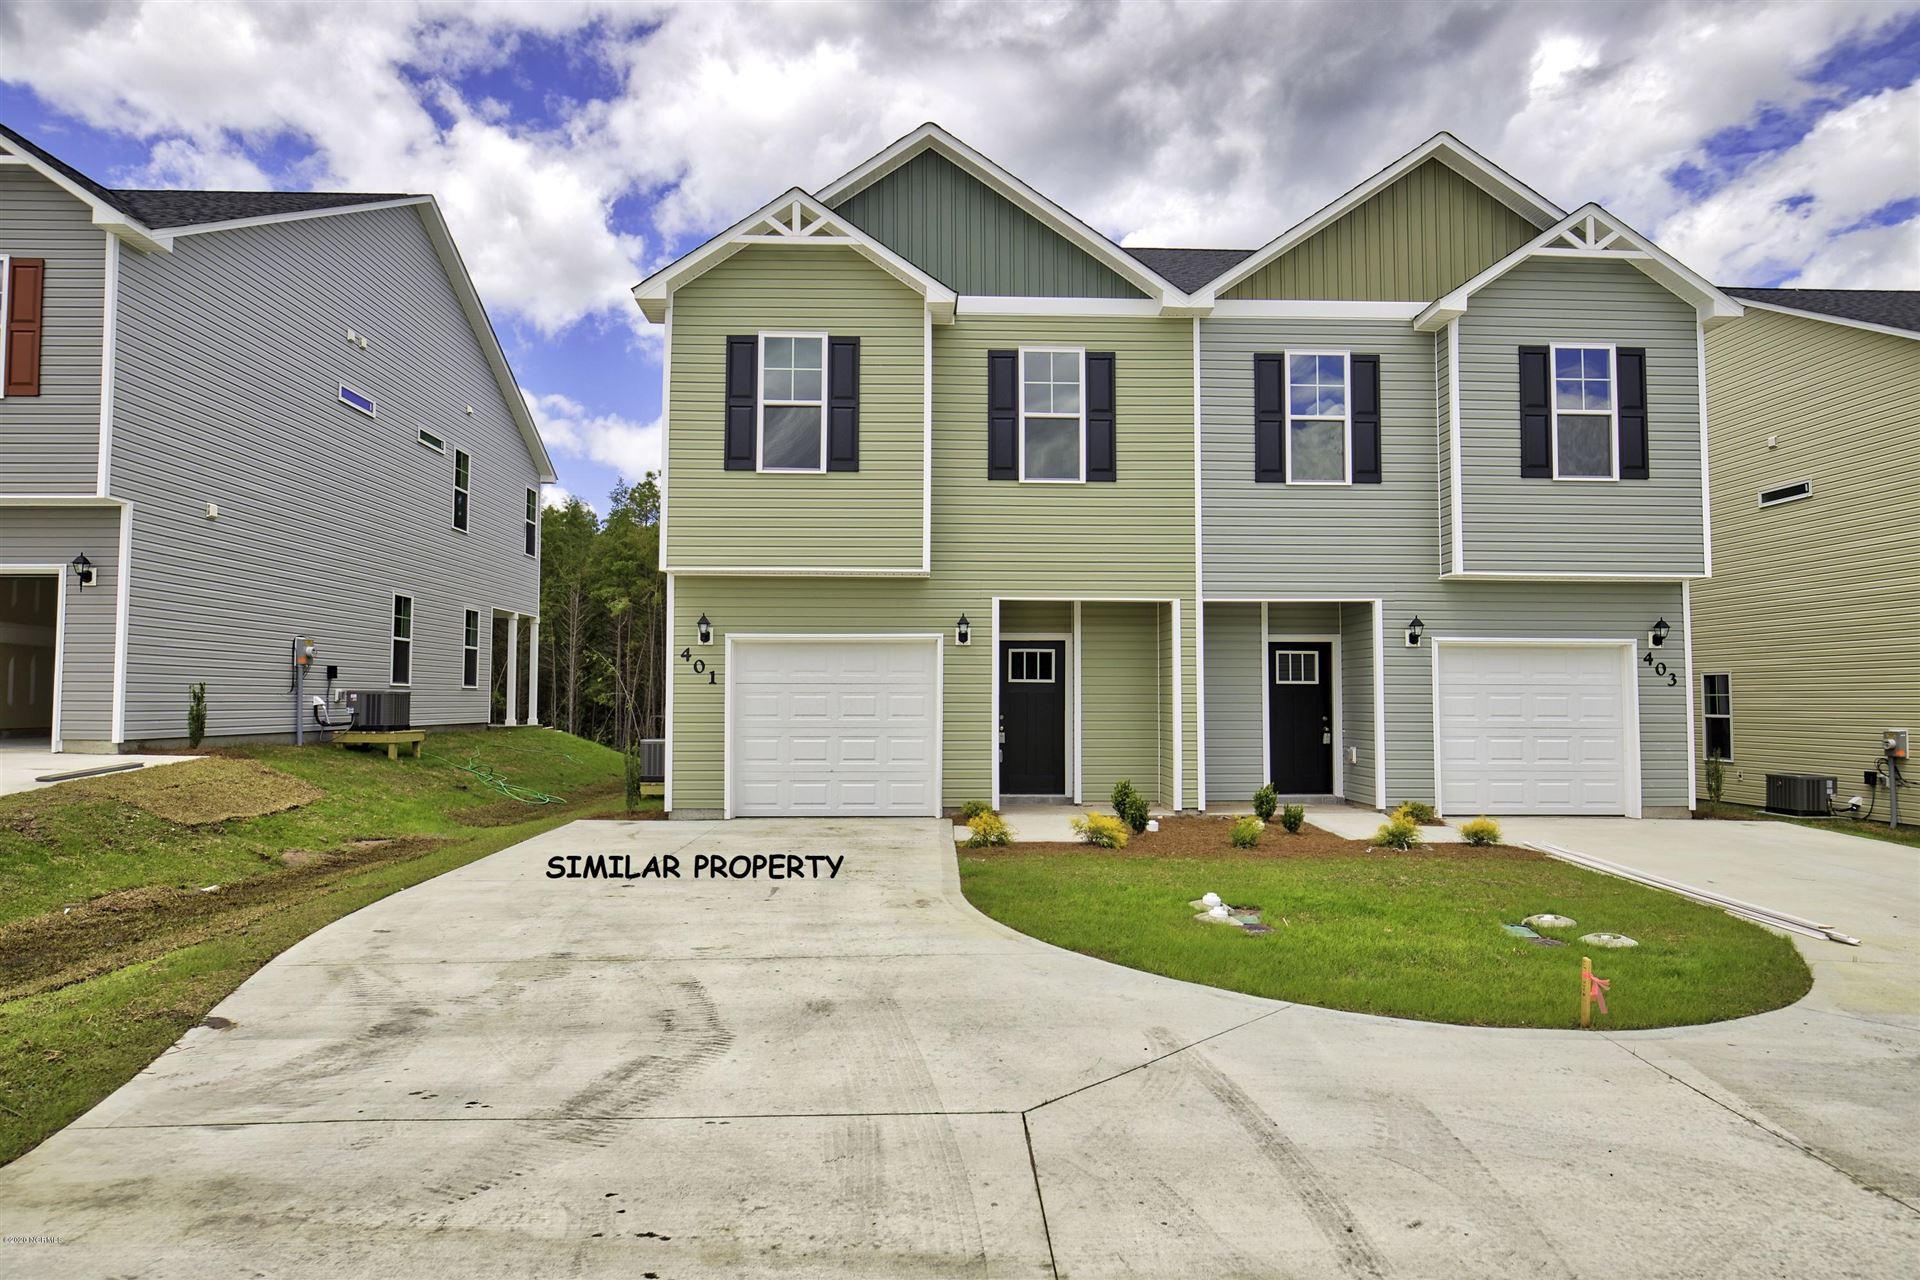 Photo of 414 Vandemere Court, Holly Ridge, NC 28445 (MLS # 100276379)